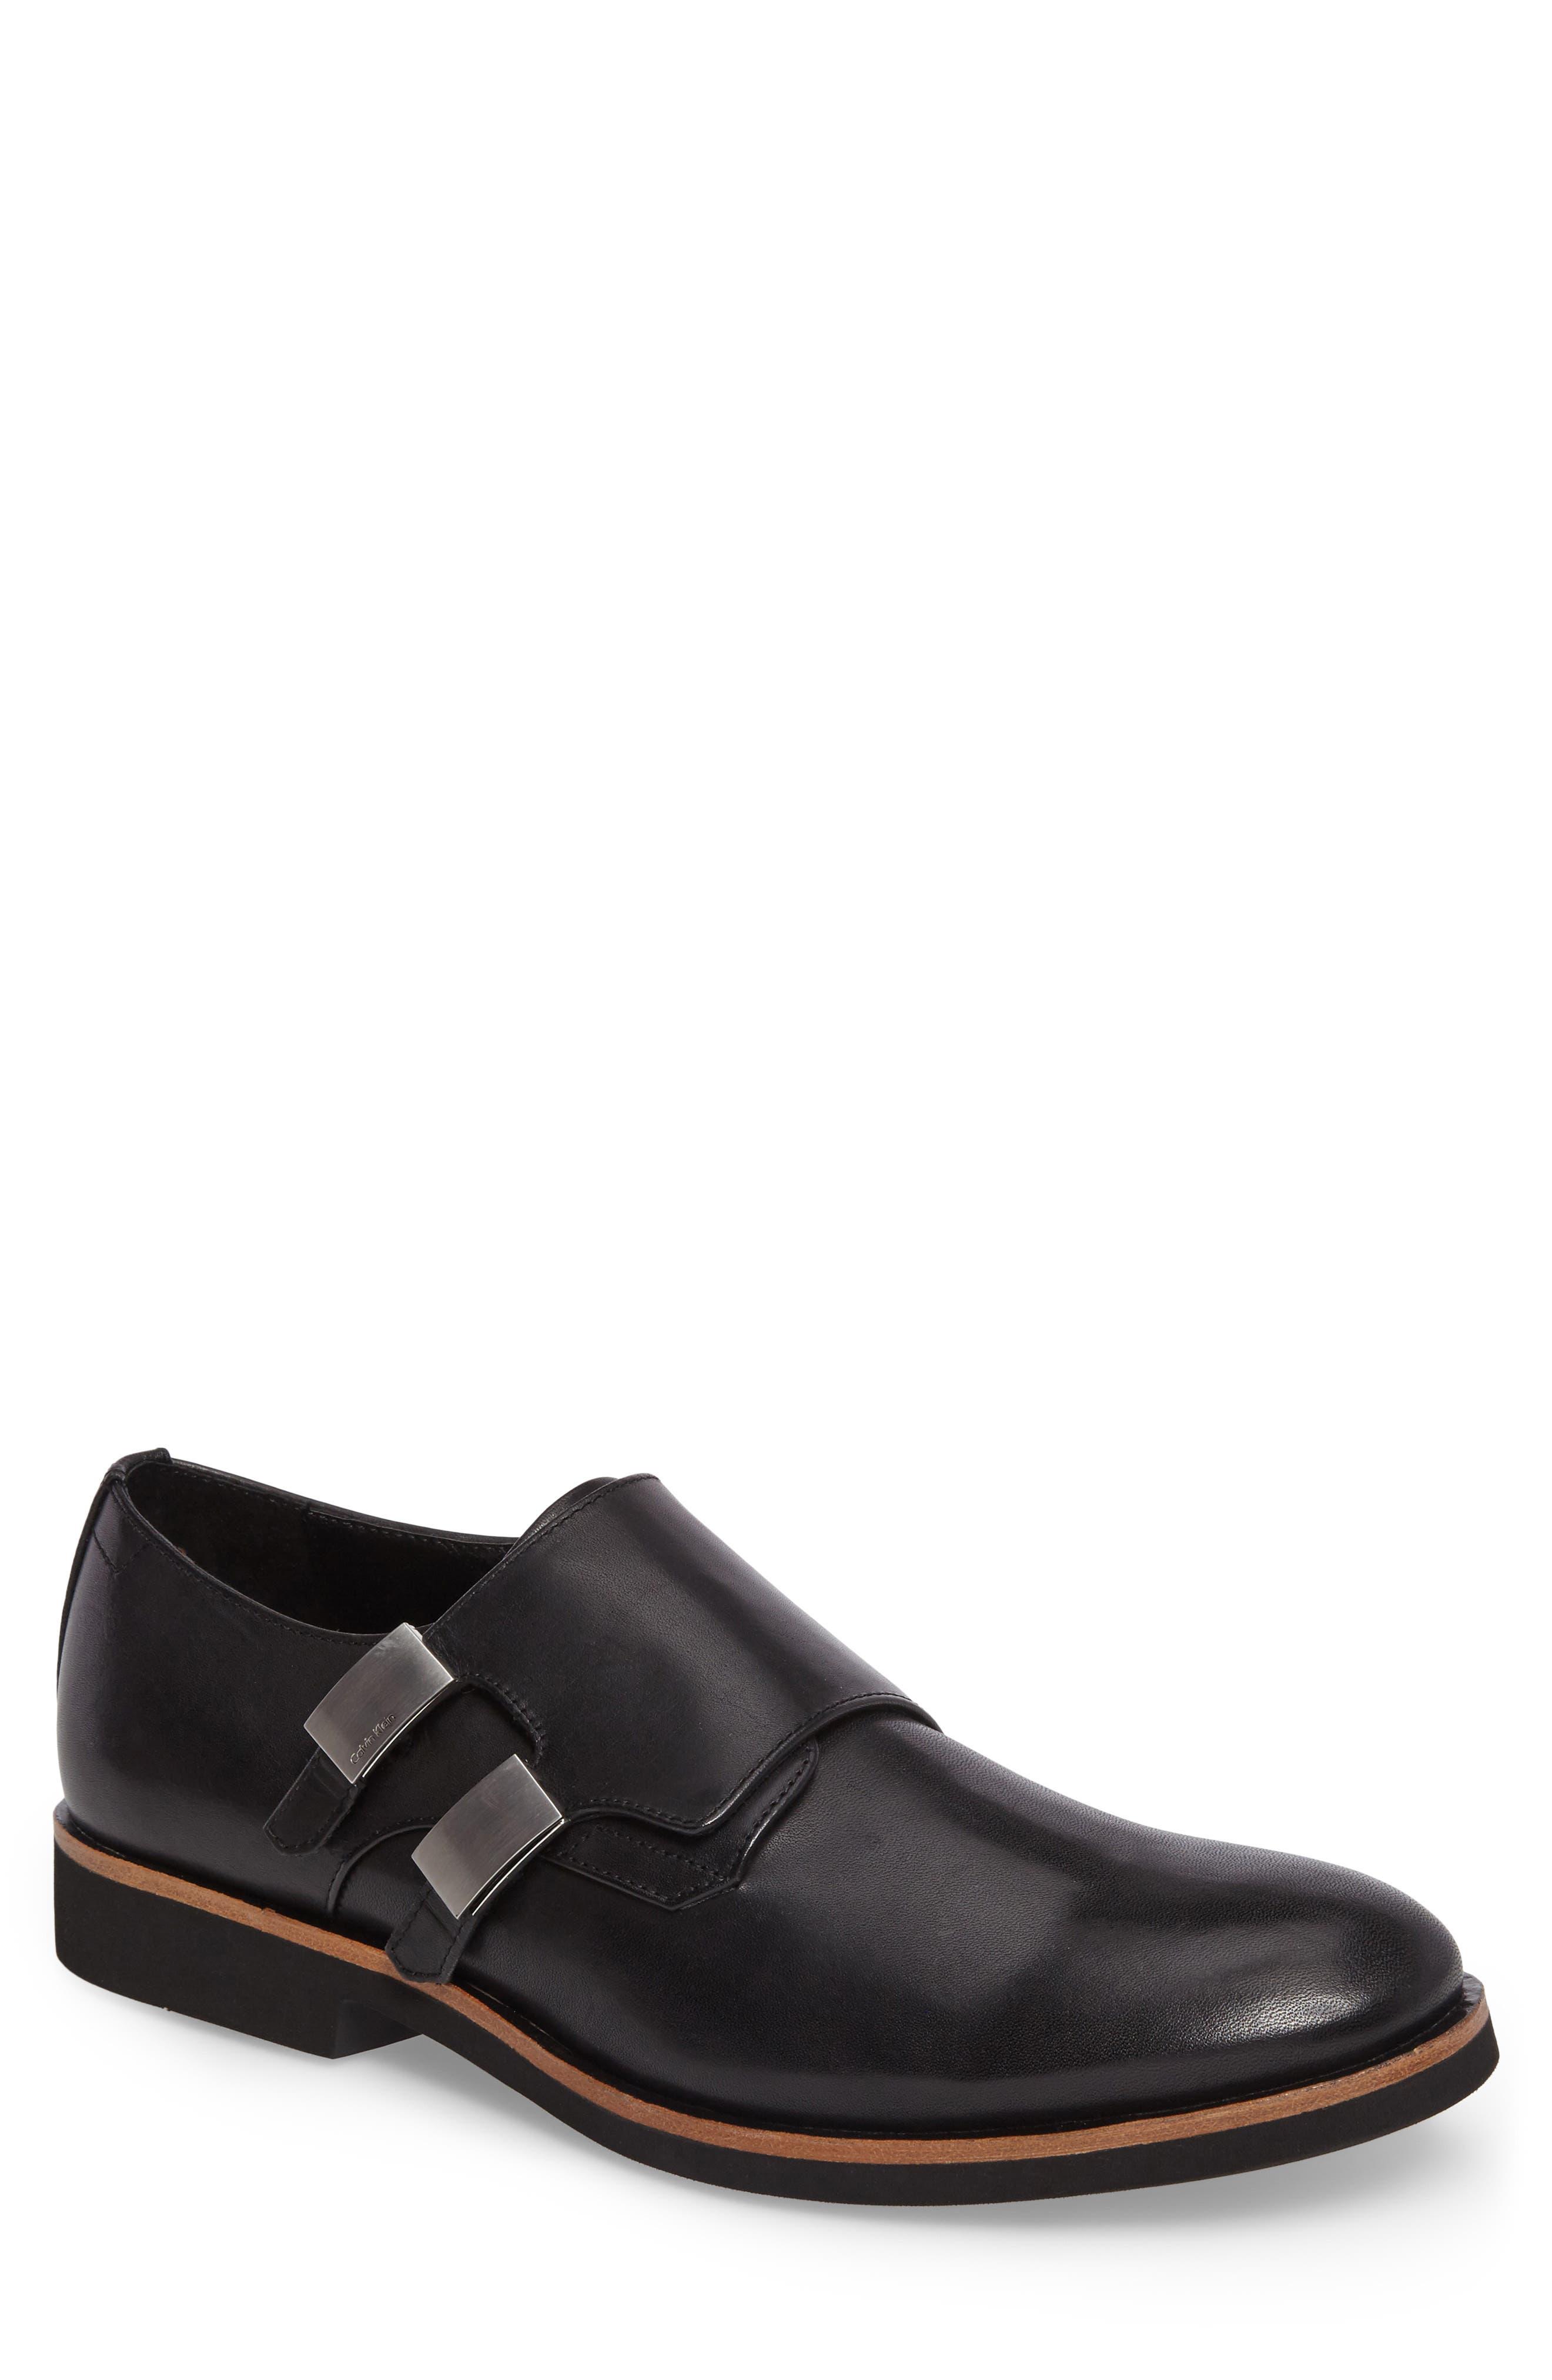 Finnegan Double Monk Strap Shoe,                             Main thumbnail 1, color,                             Black Leather